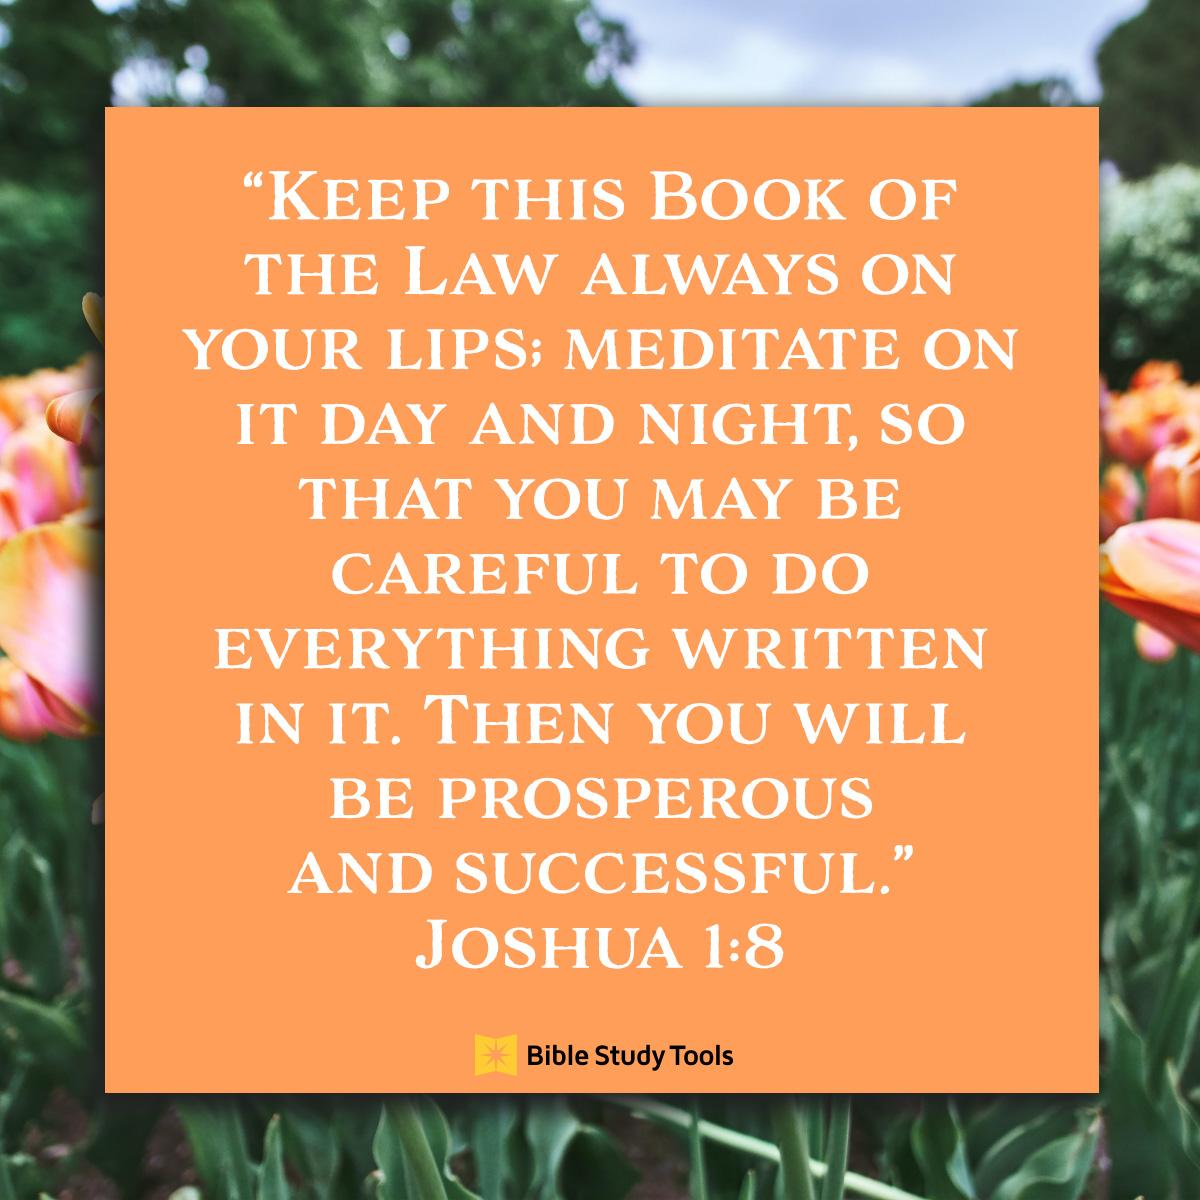 Joshua 1:8; inspirational image